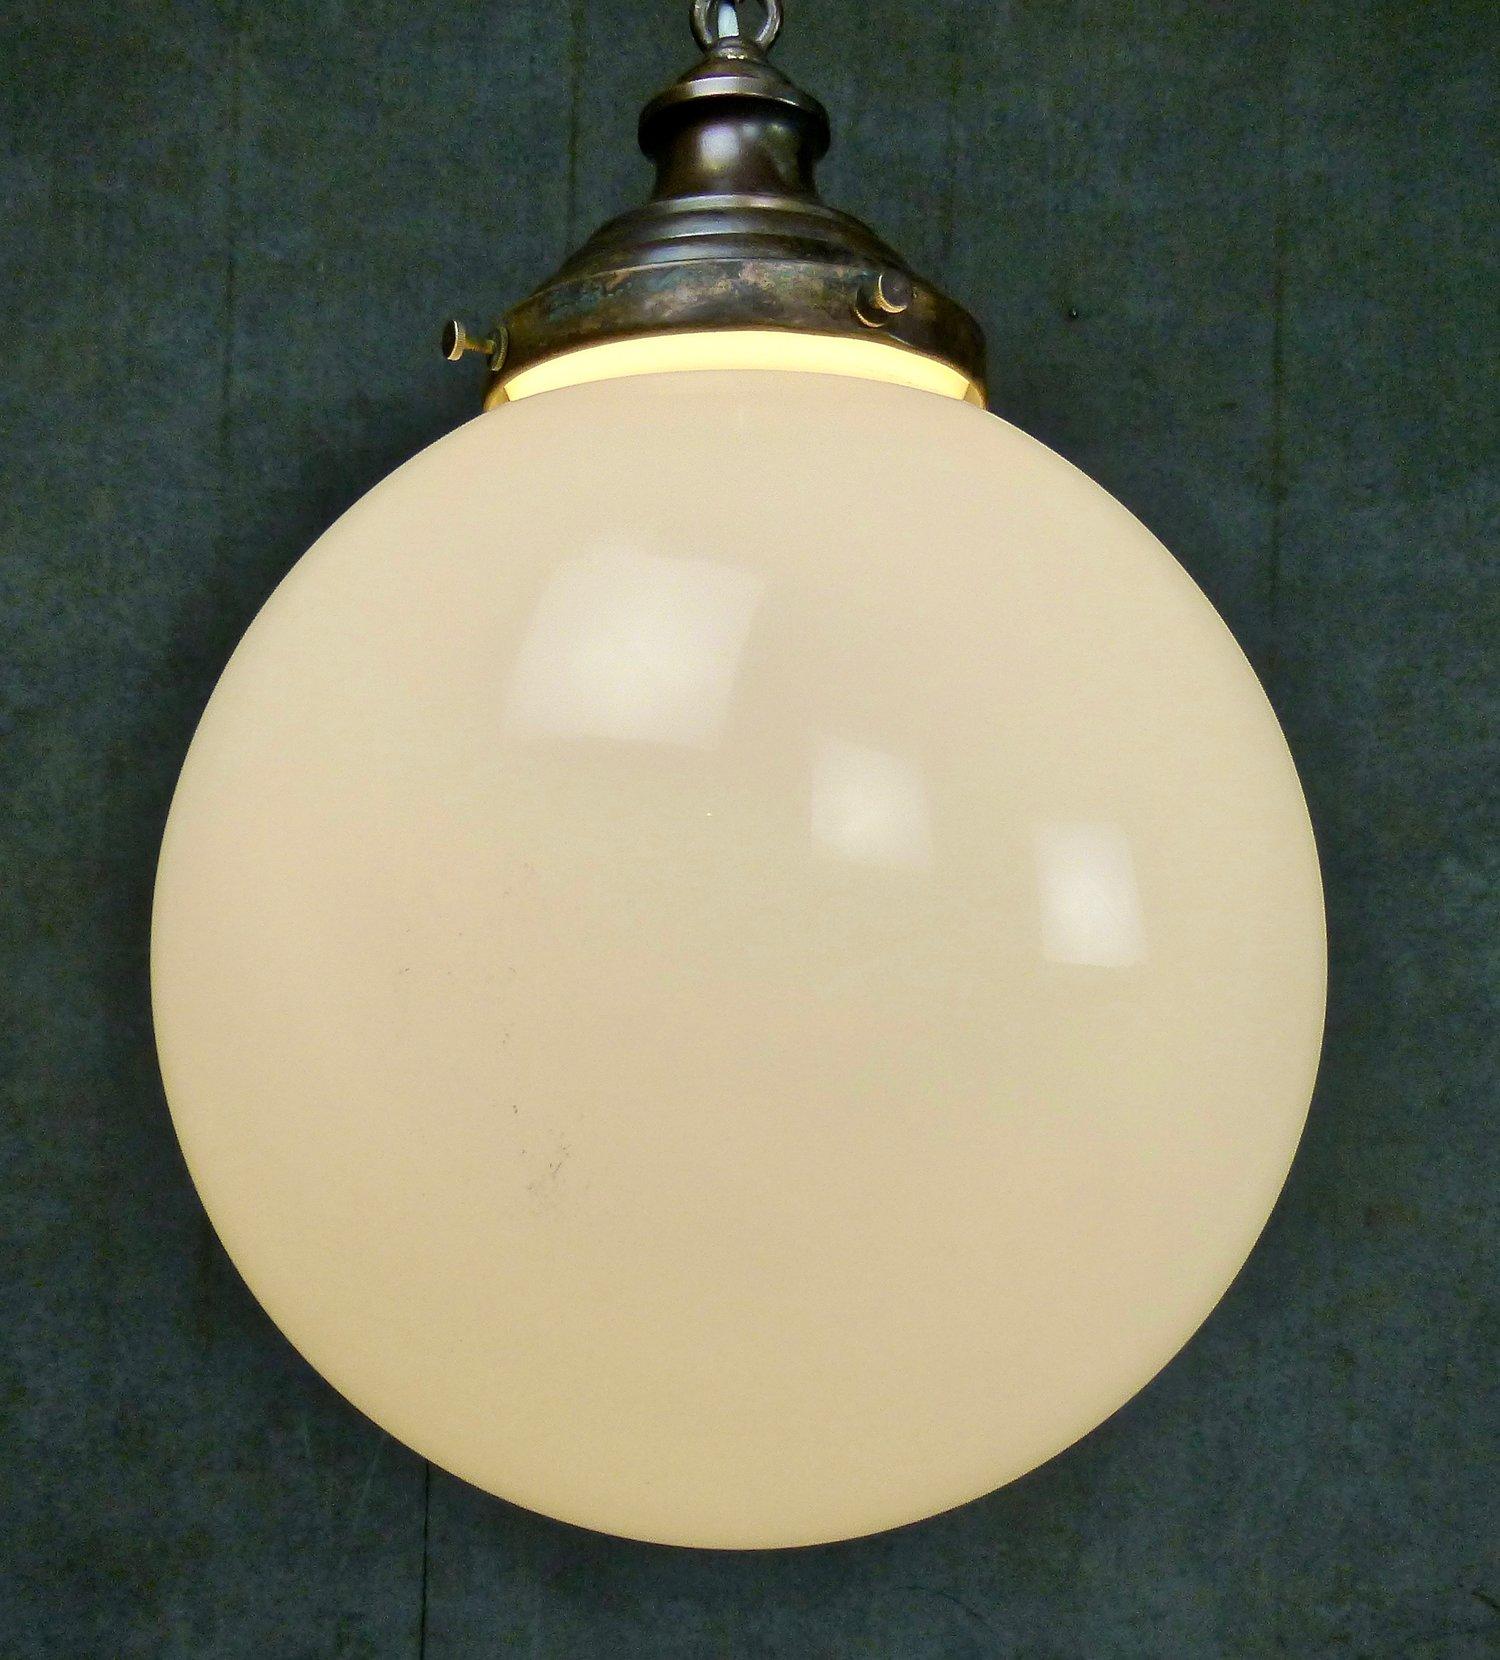 Antique Brass And Copper Ceiling Light Fixtureounts